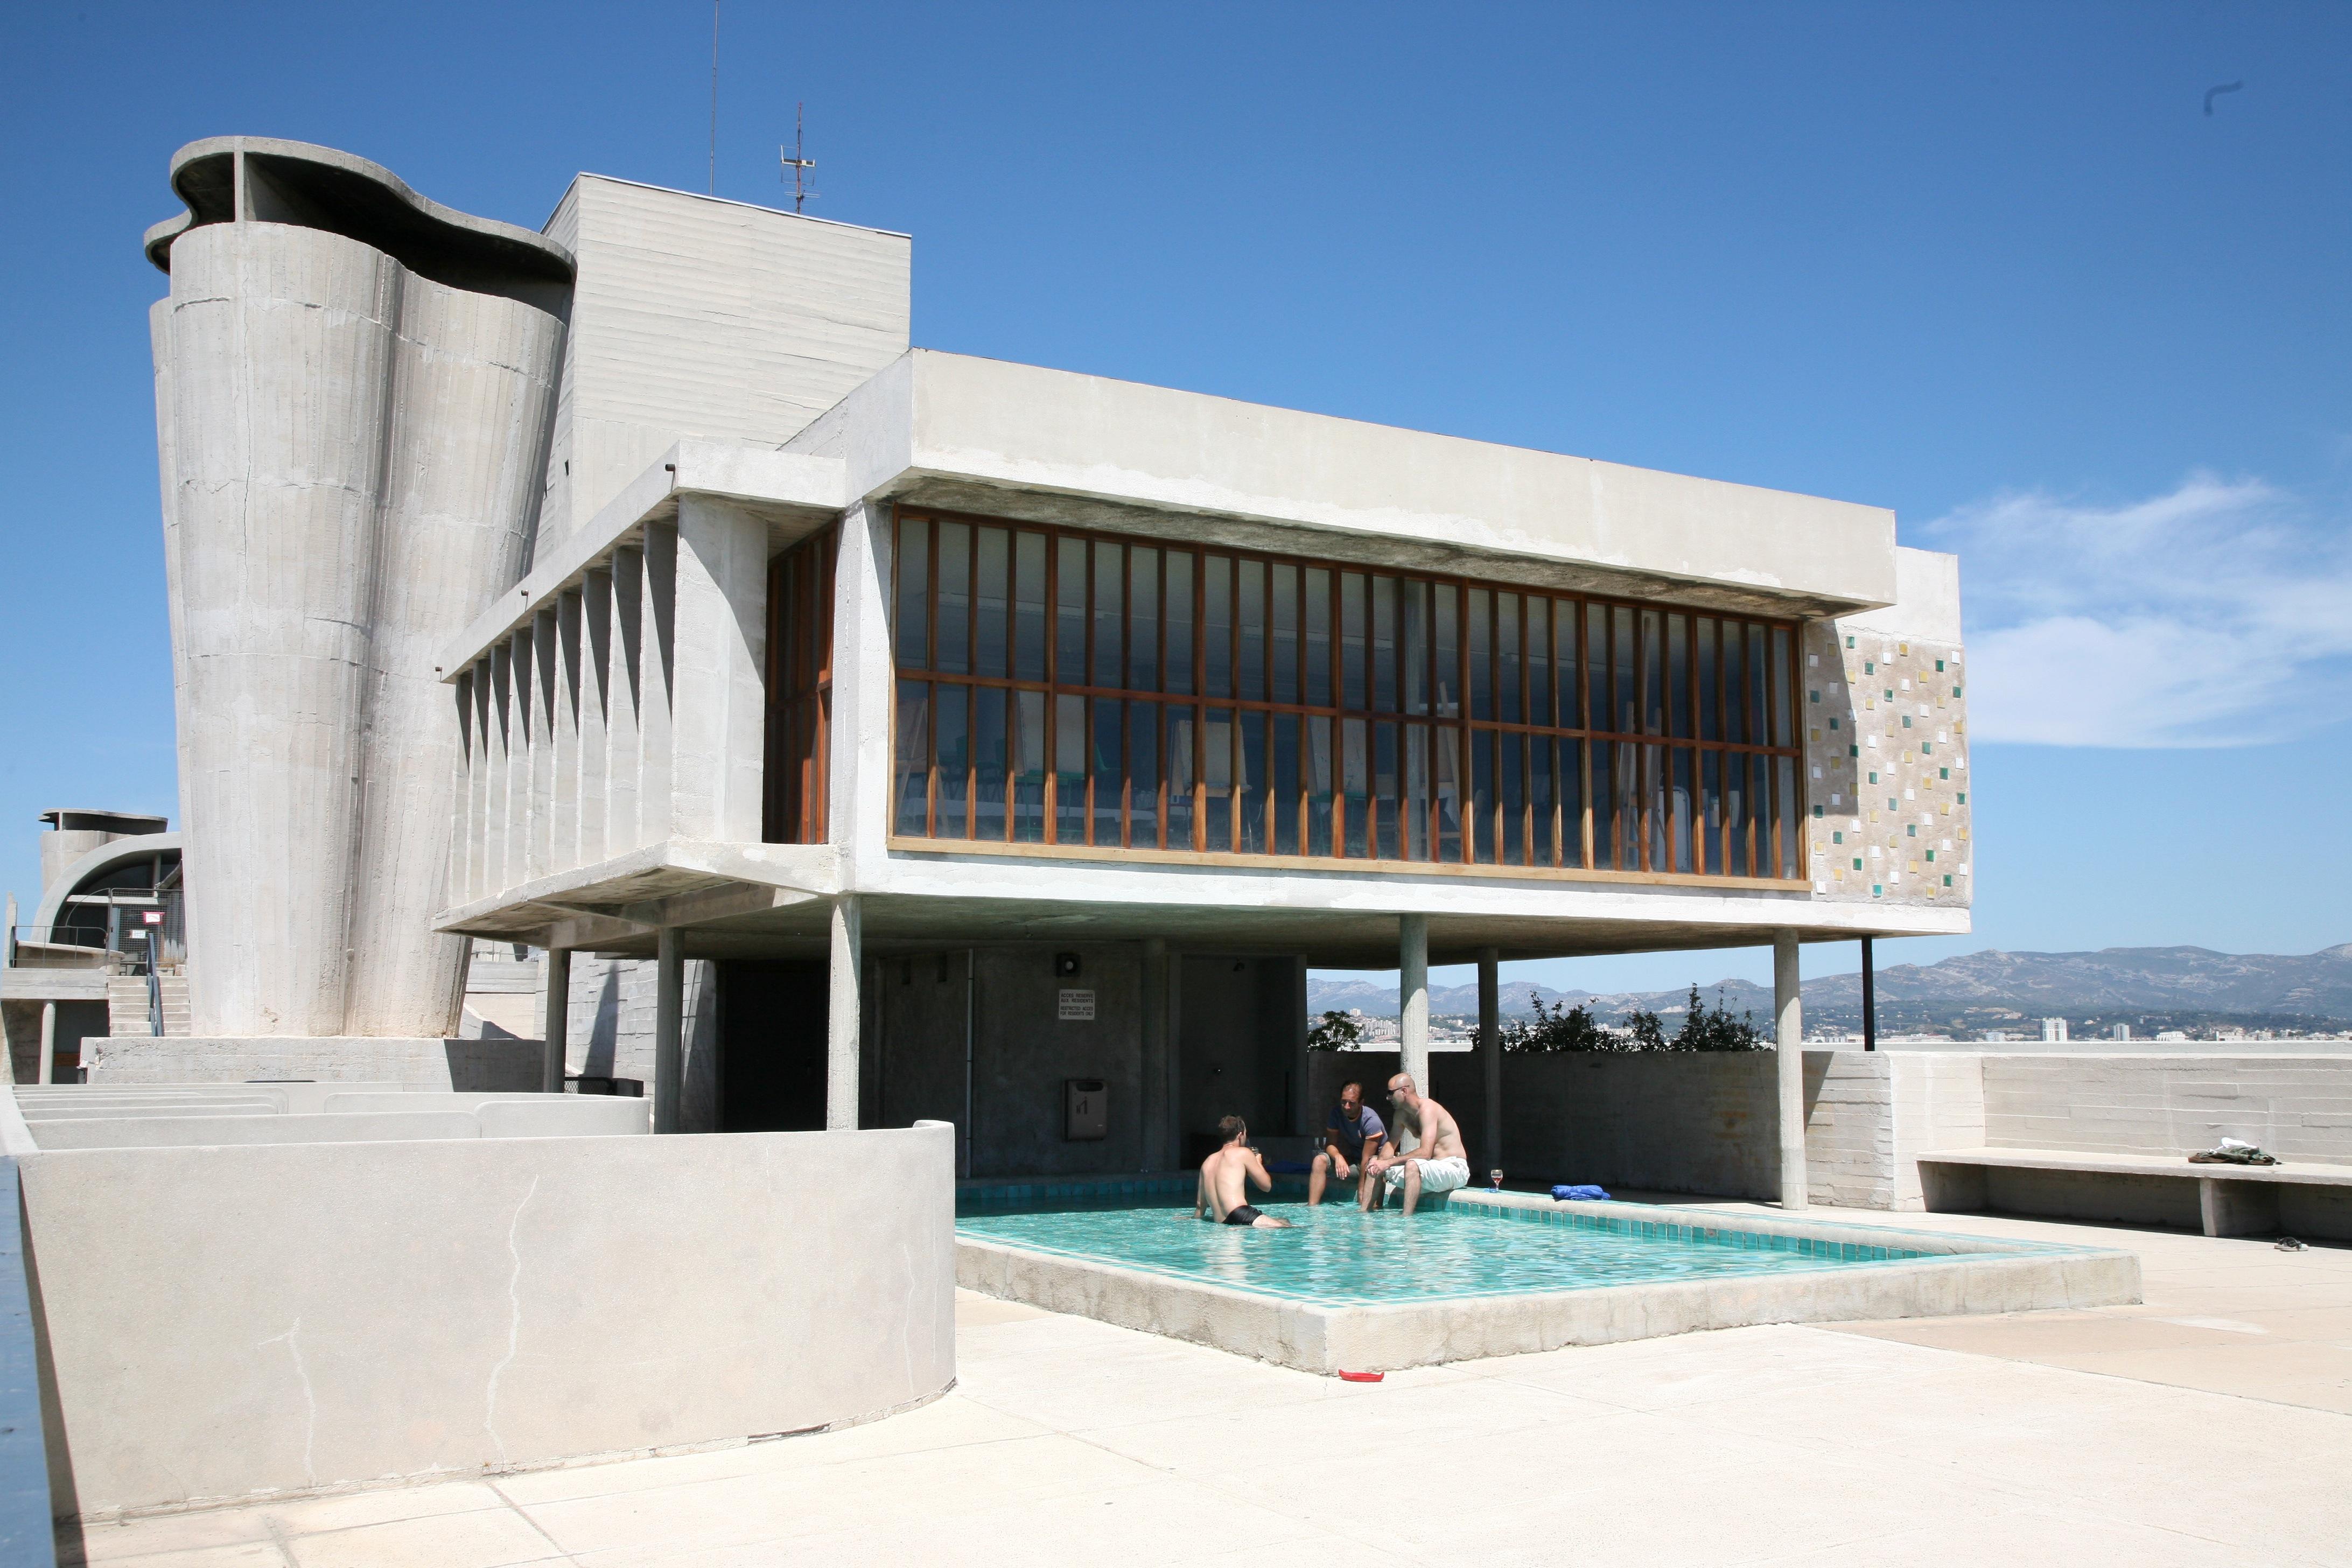 Fotos Gratis Arquitectura Villa Edificio Fachada